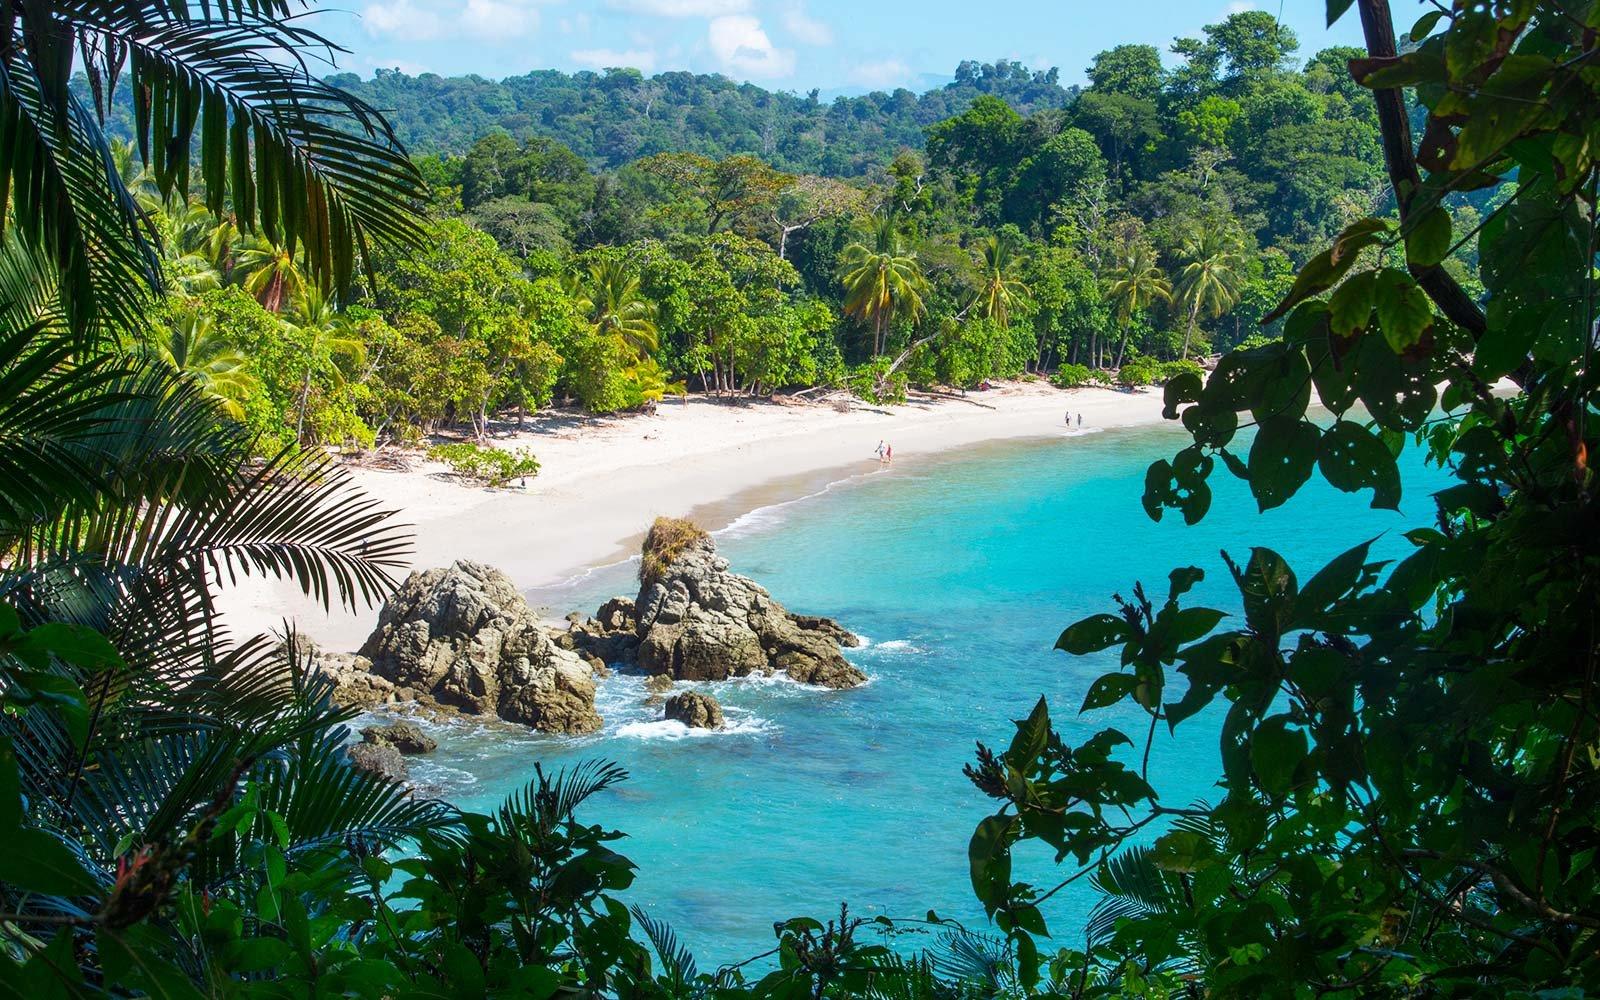 manuel-antonio-beach-costa-rica-CRFLIGHTDEAL1017.jpg